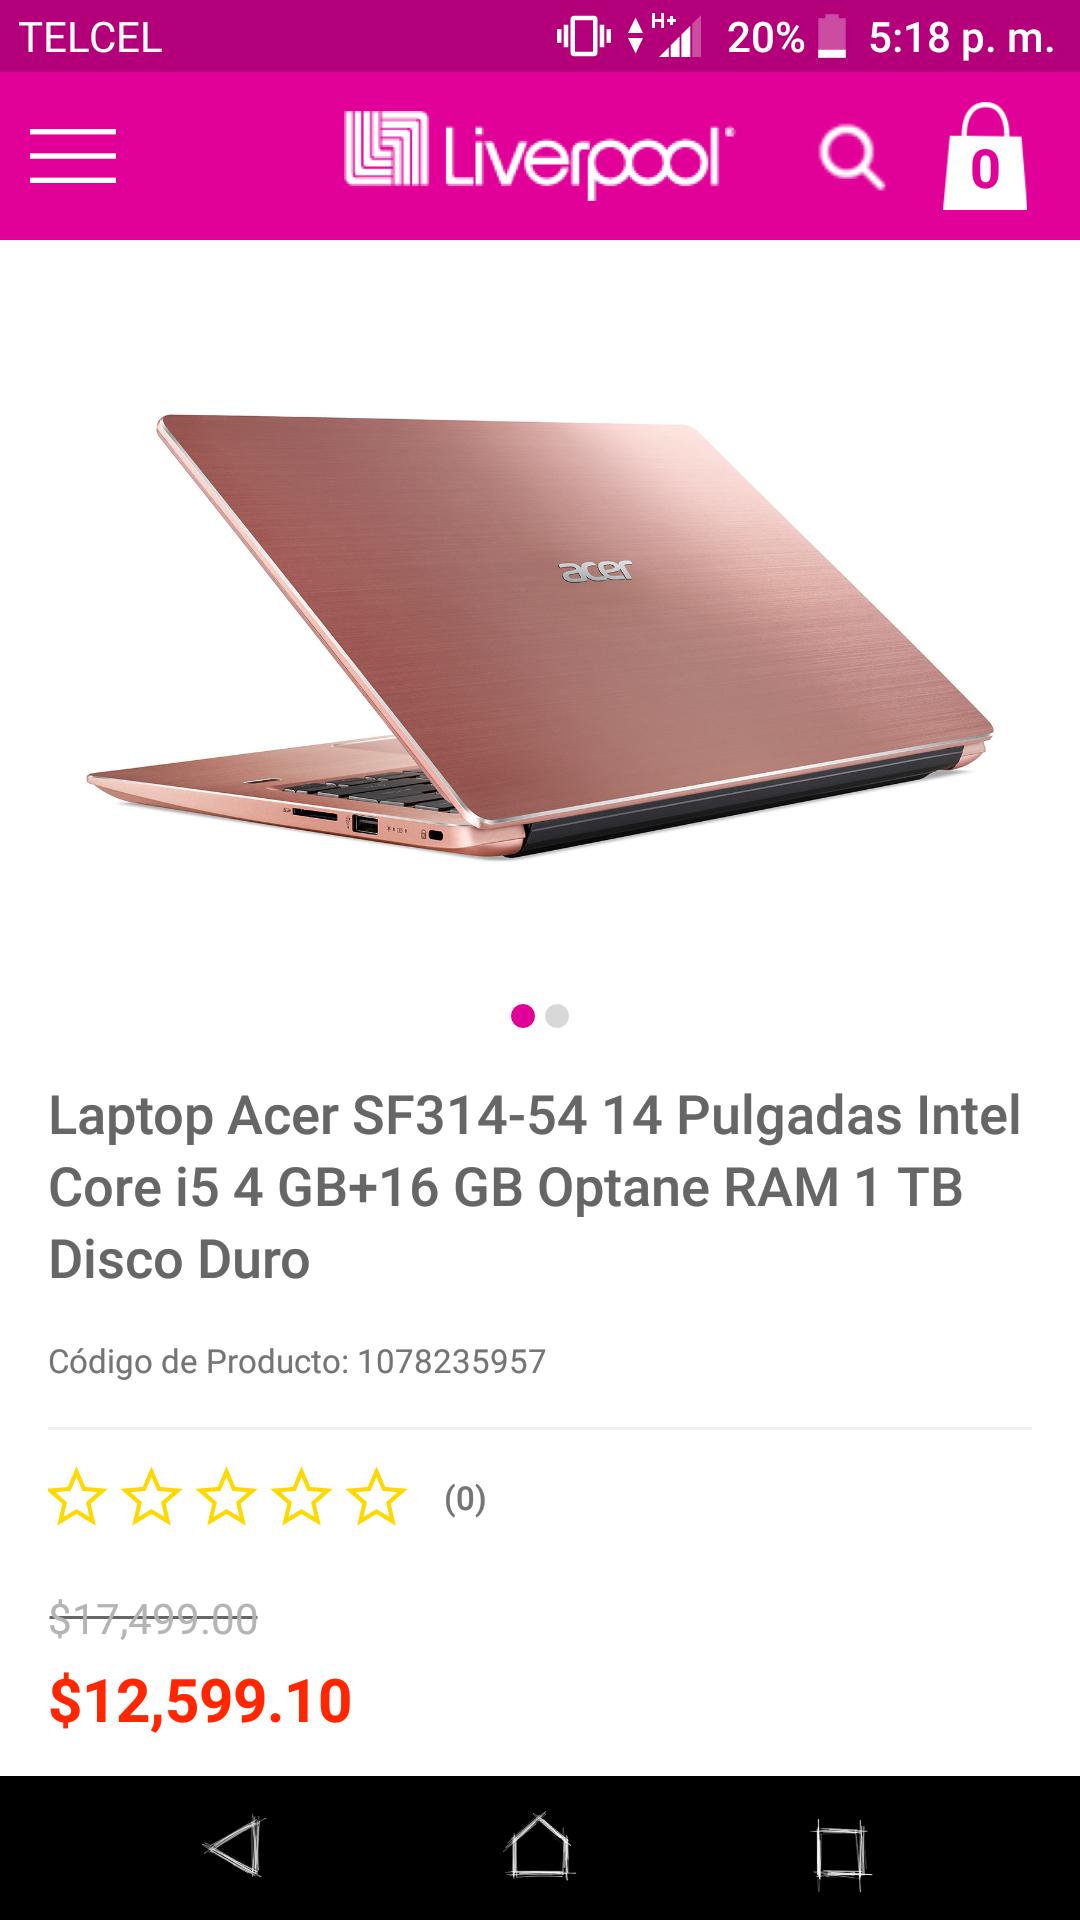 Liverpool: Laptop Acer SF314-54 -14 Pulgadas Intel Core i5 4 GB+16 GB Optane RAM 1 TB Disco Duro